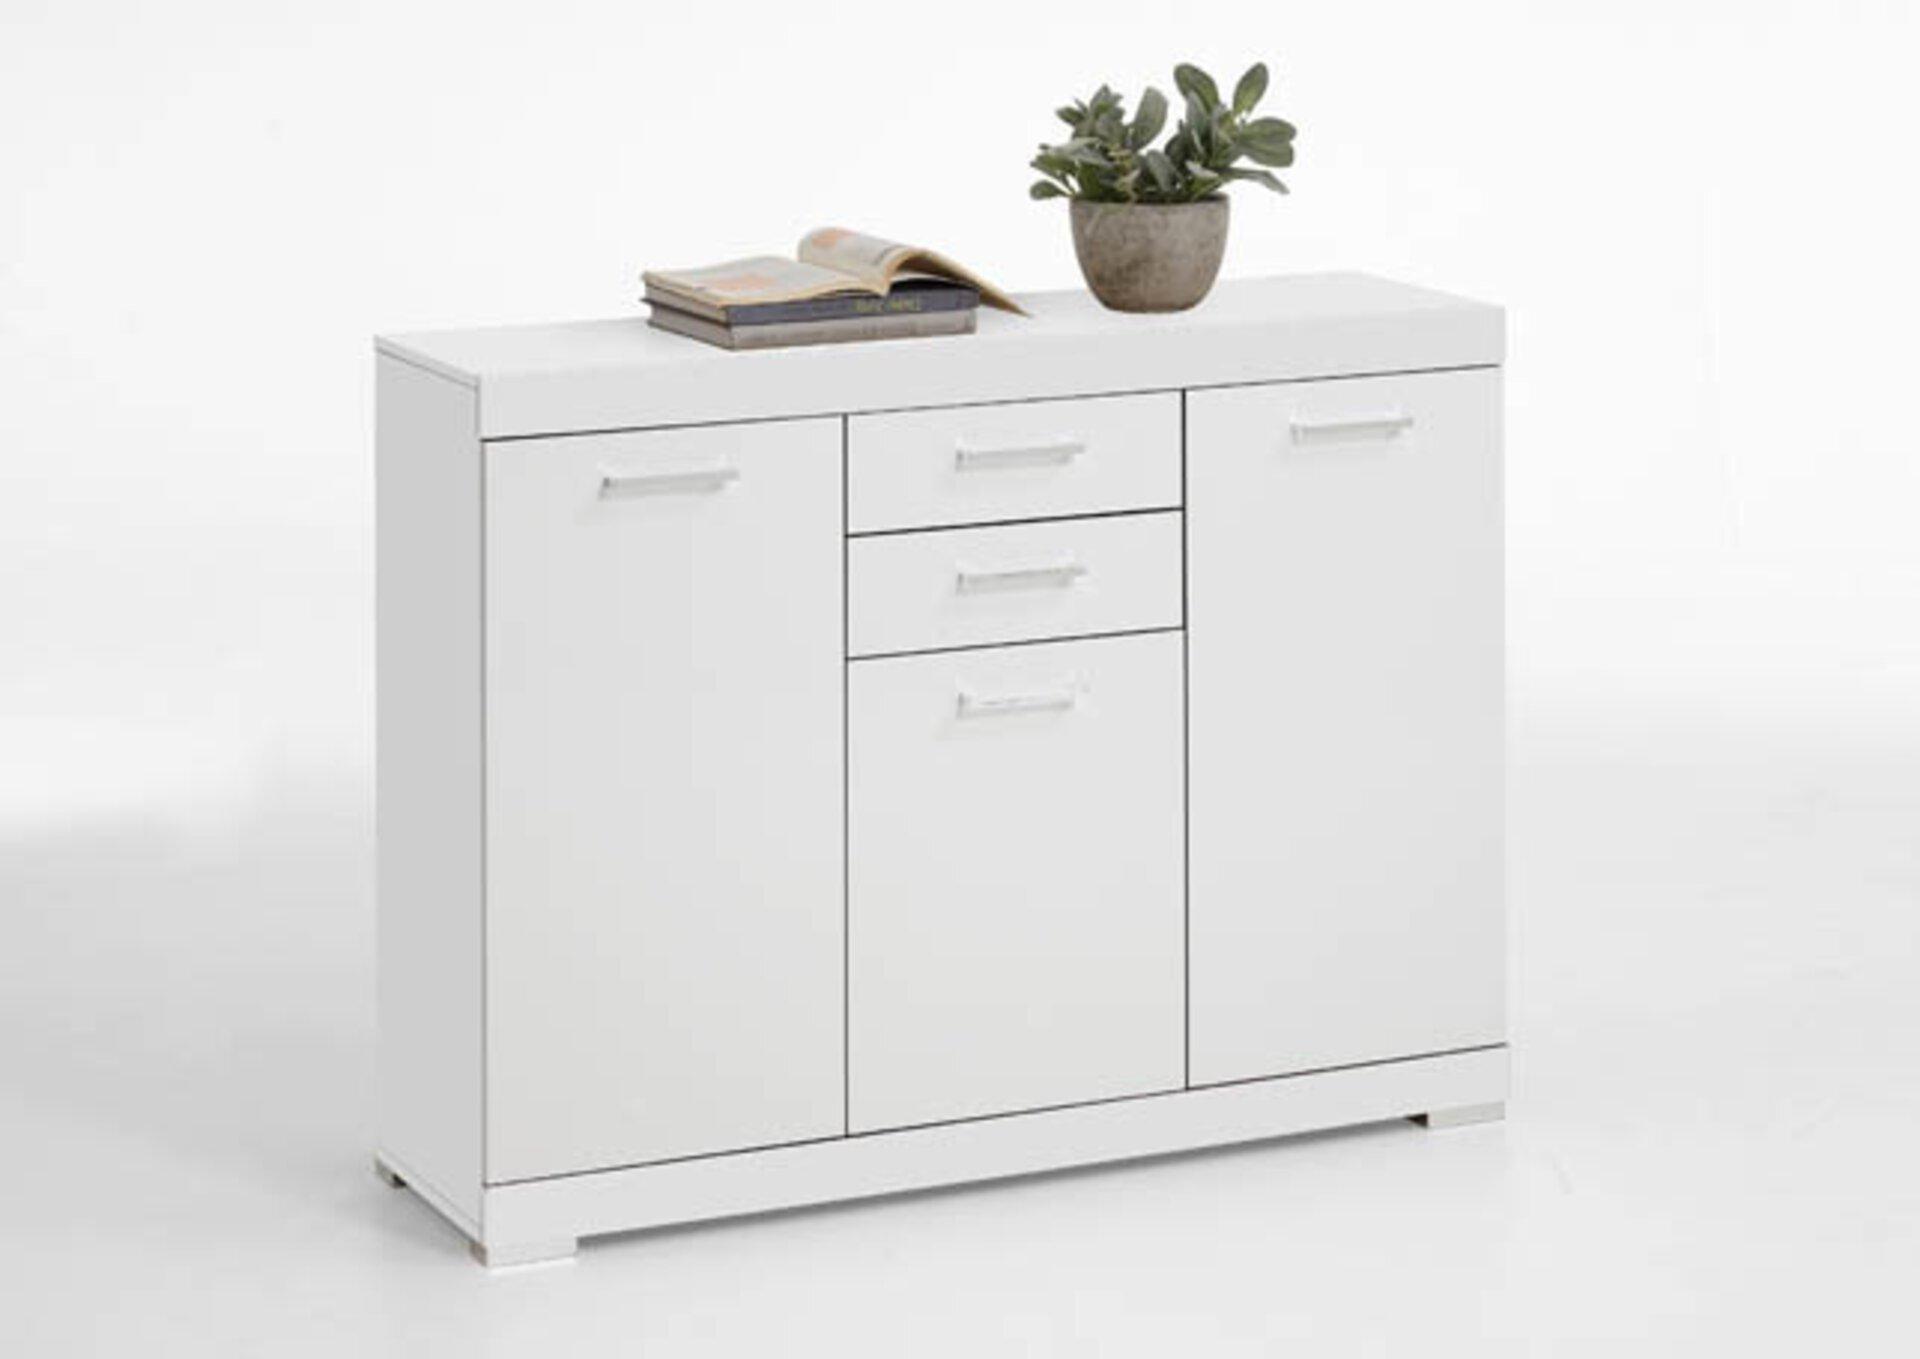 Kommode inbuy Holzwerkstoff weiß 35 x 90 x 120 cm